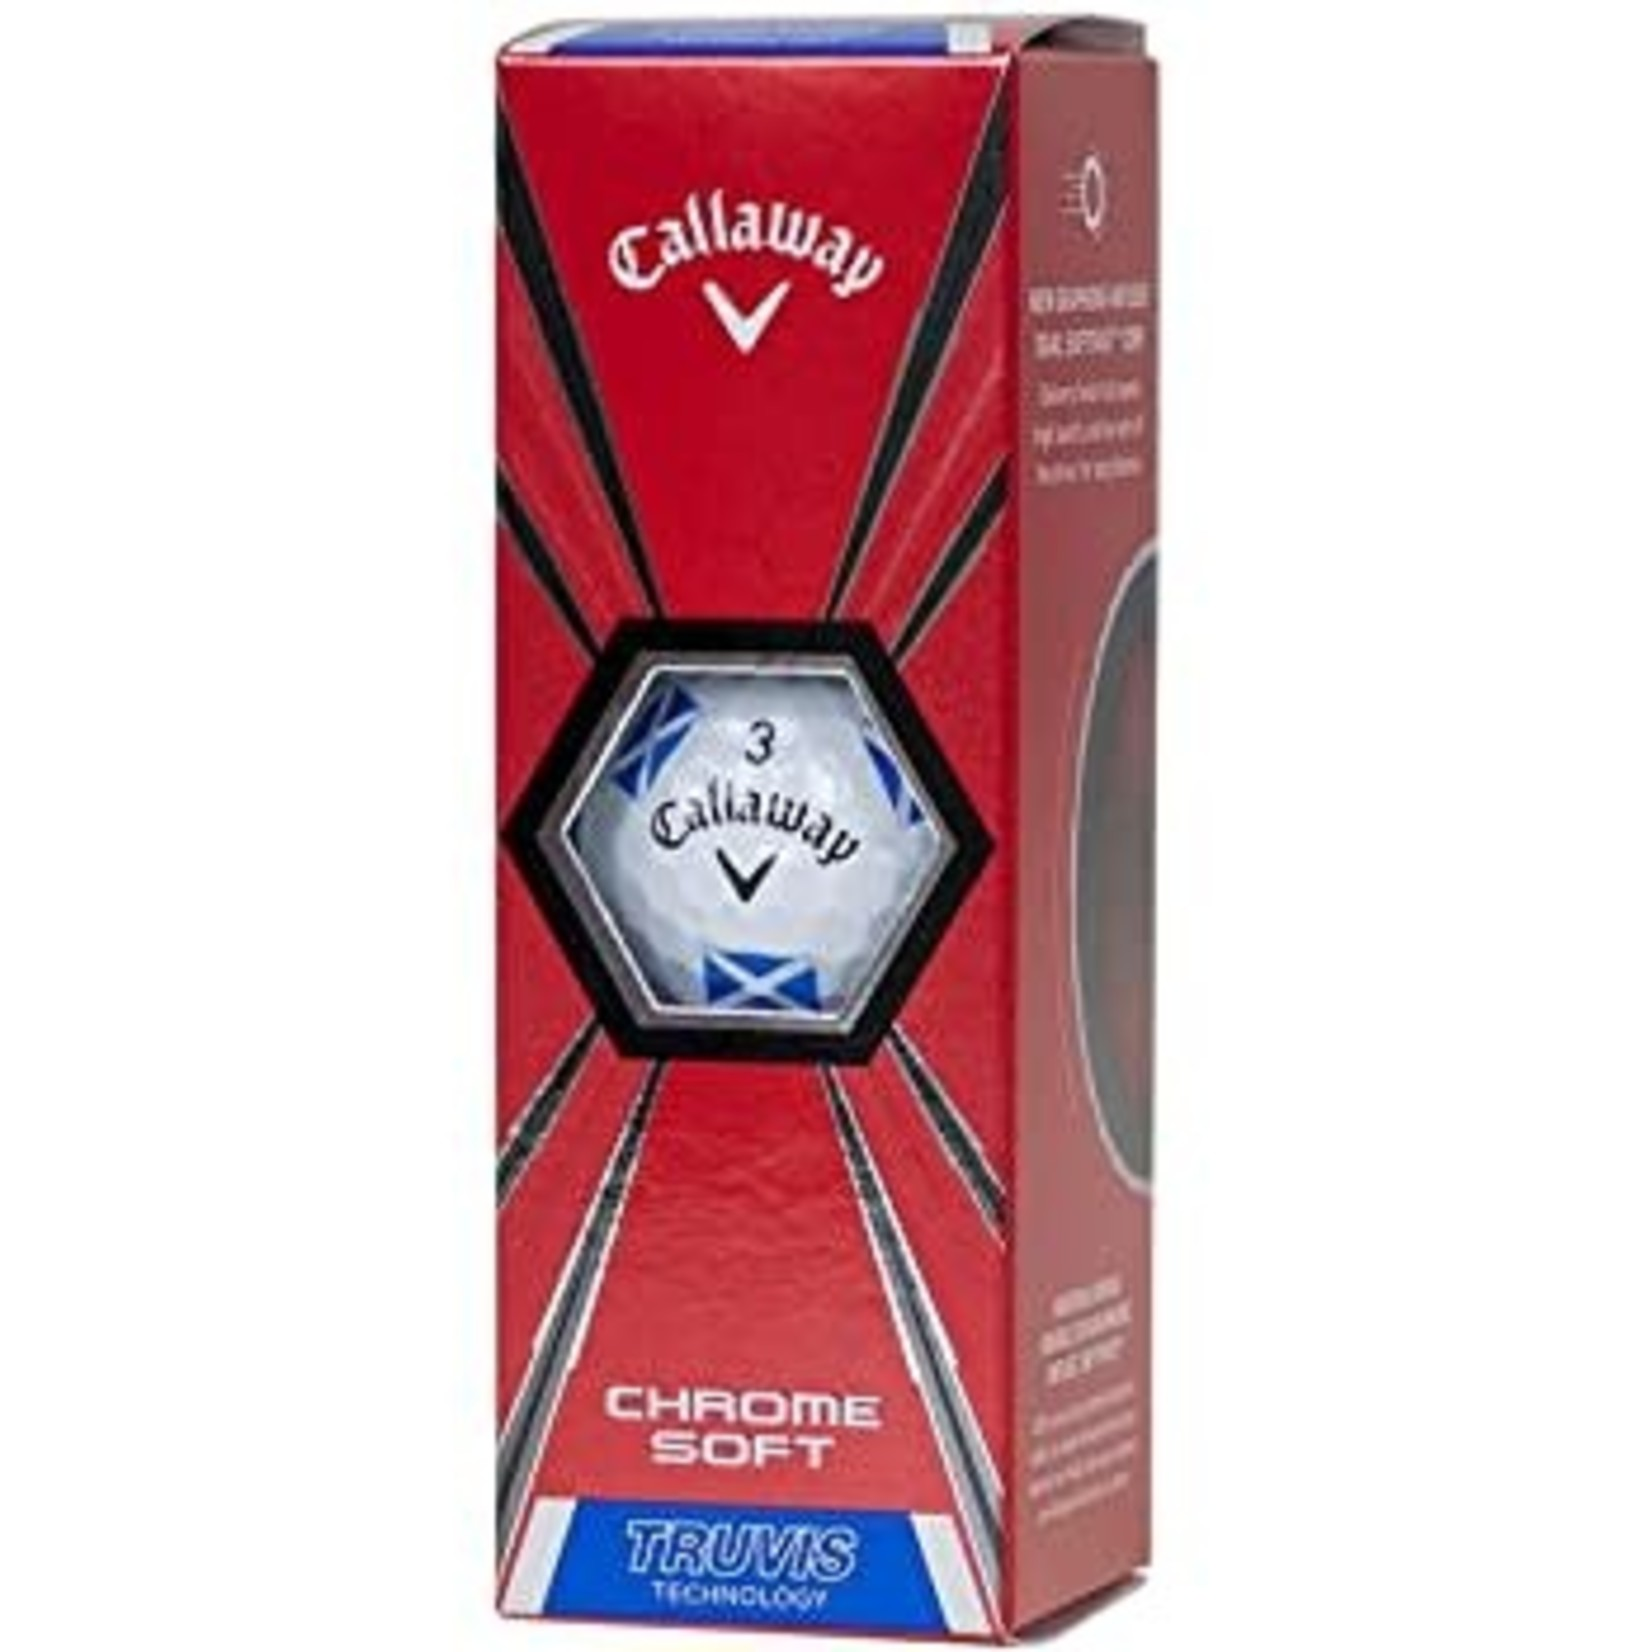 Callaway Callaway Chromesoft sleeve3 schotland Truvis